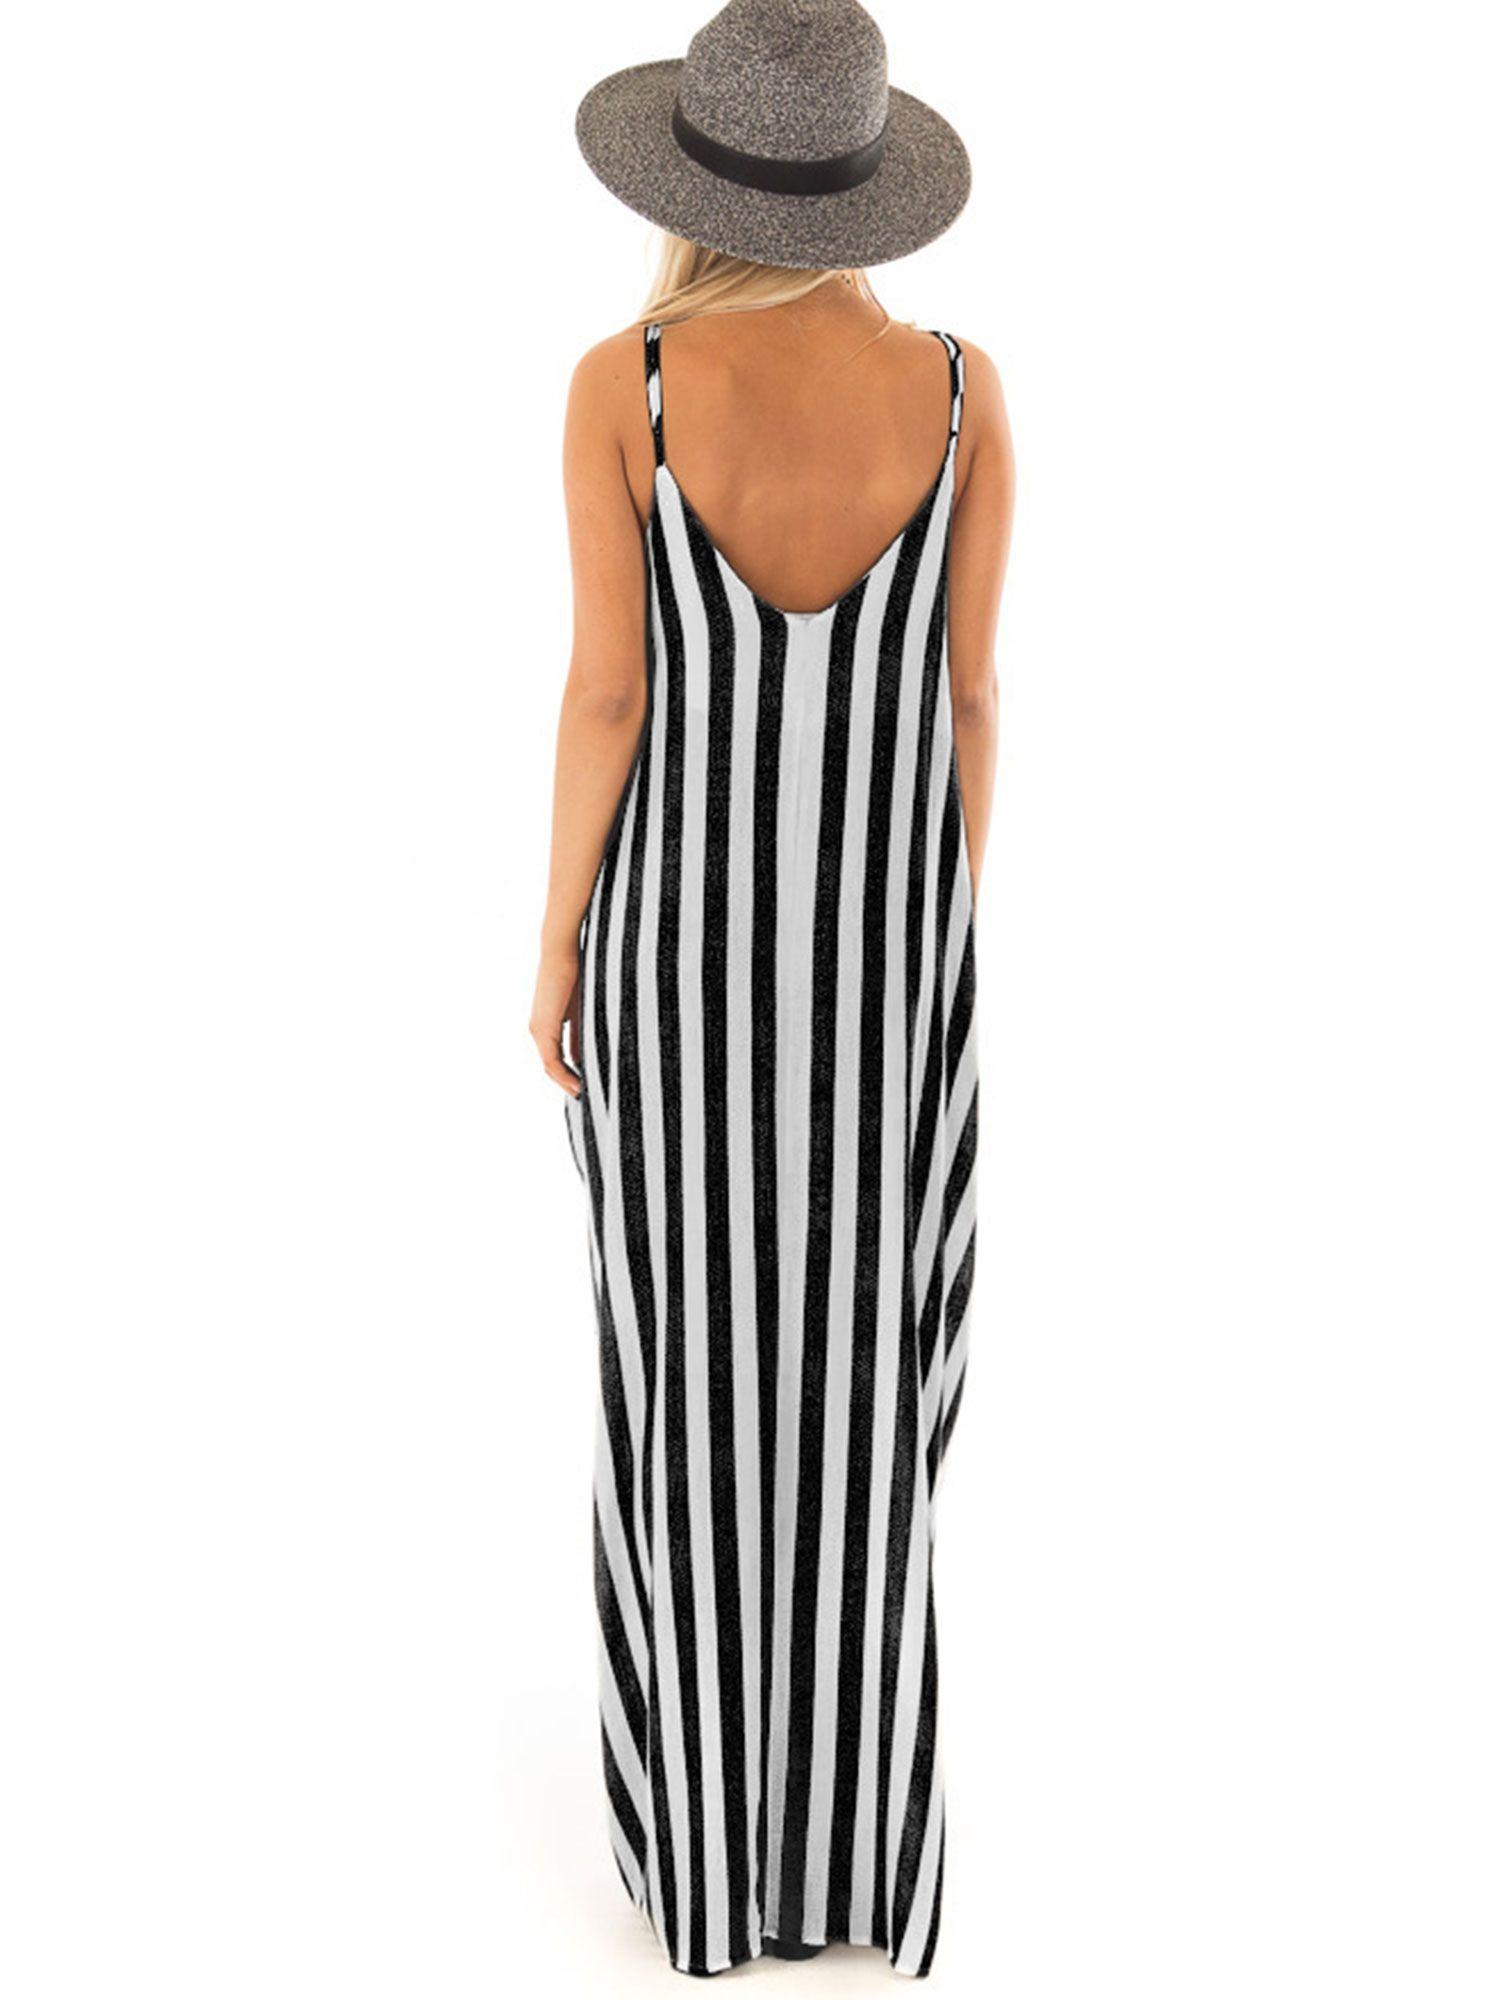 Women Boho Striped Strap Sling Long Maxi Dress V Neck Evening Party Beach Dresses Summer Sundress Ad Sling Womens Maxi Dresses Maxi Dress Maxi Dress Pattern [ 2000 x 1500 Pixel ]